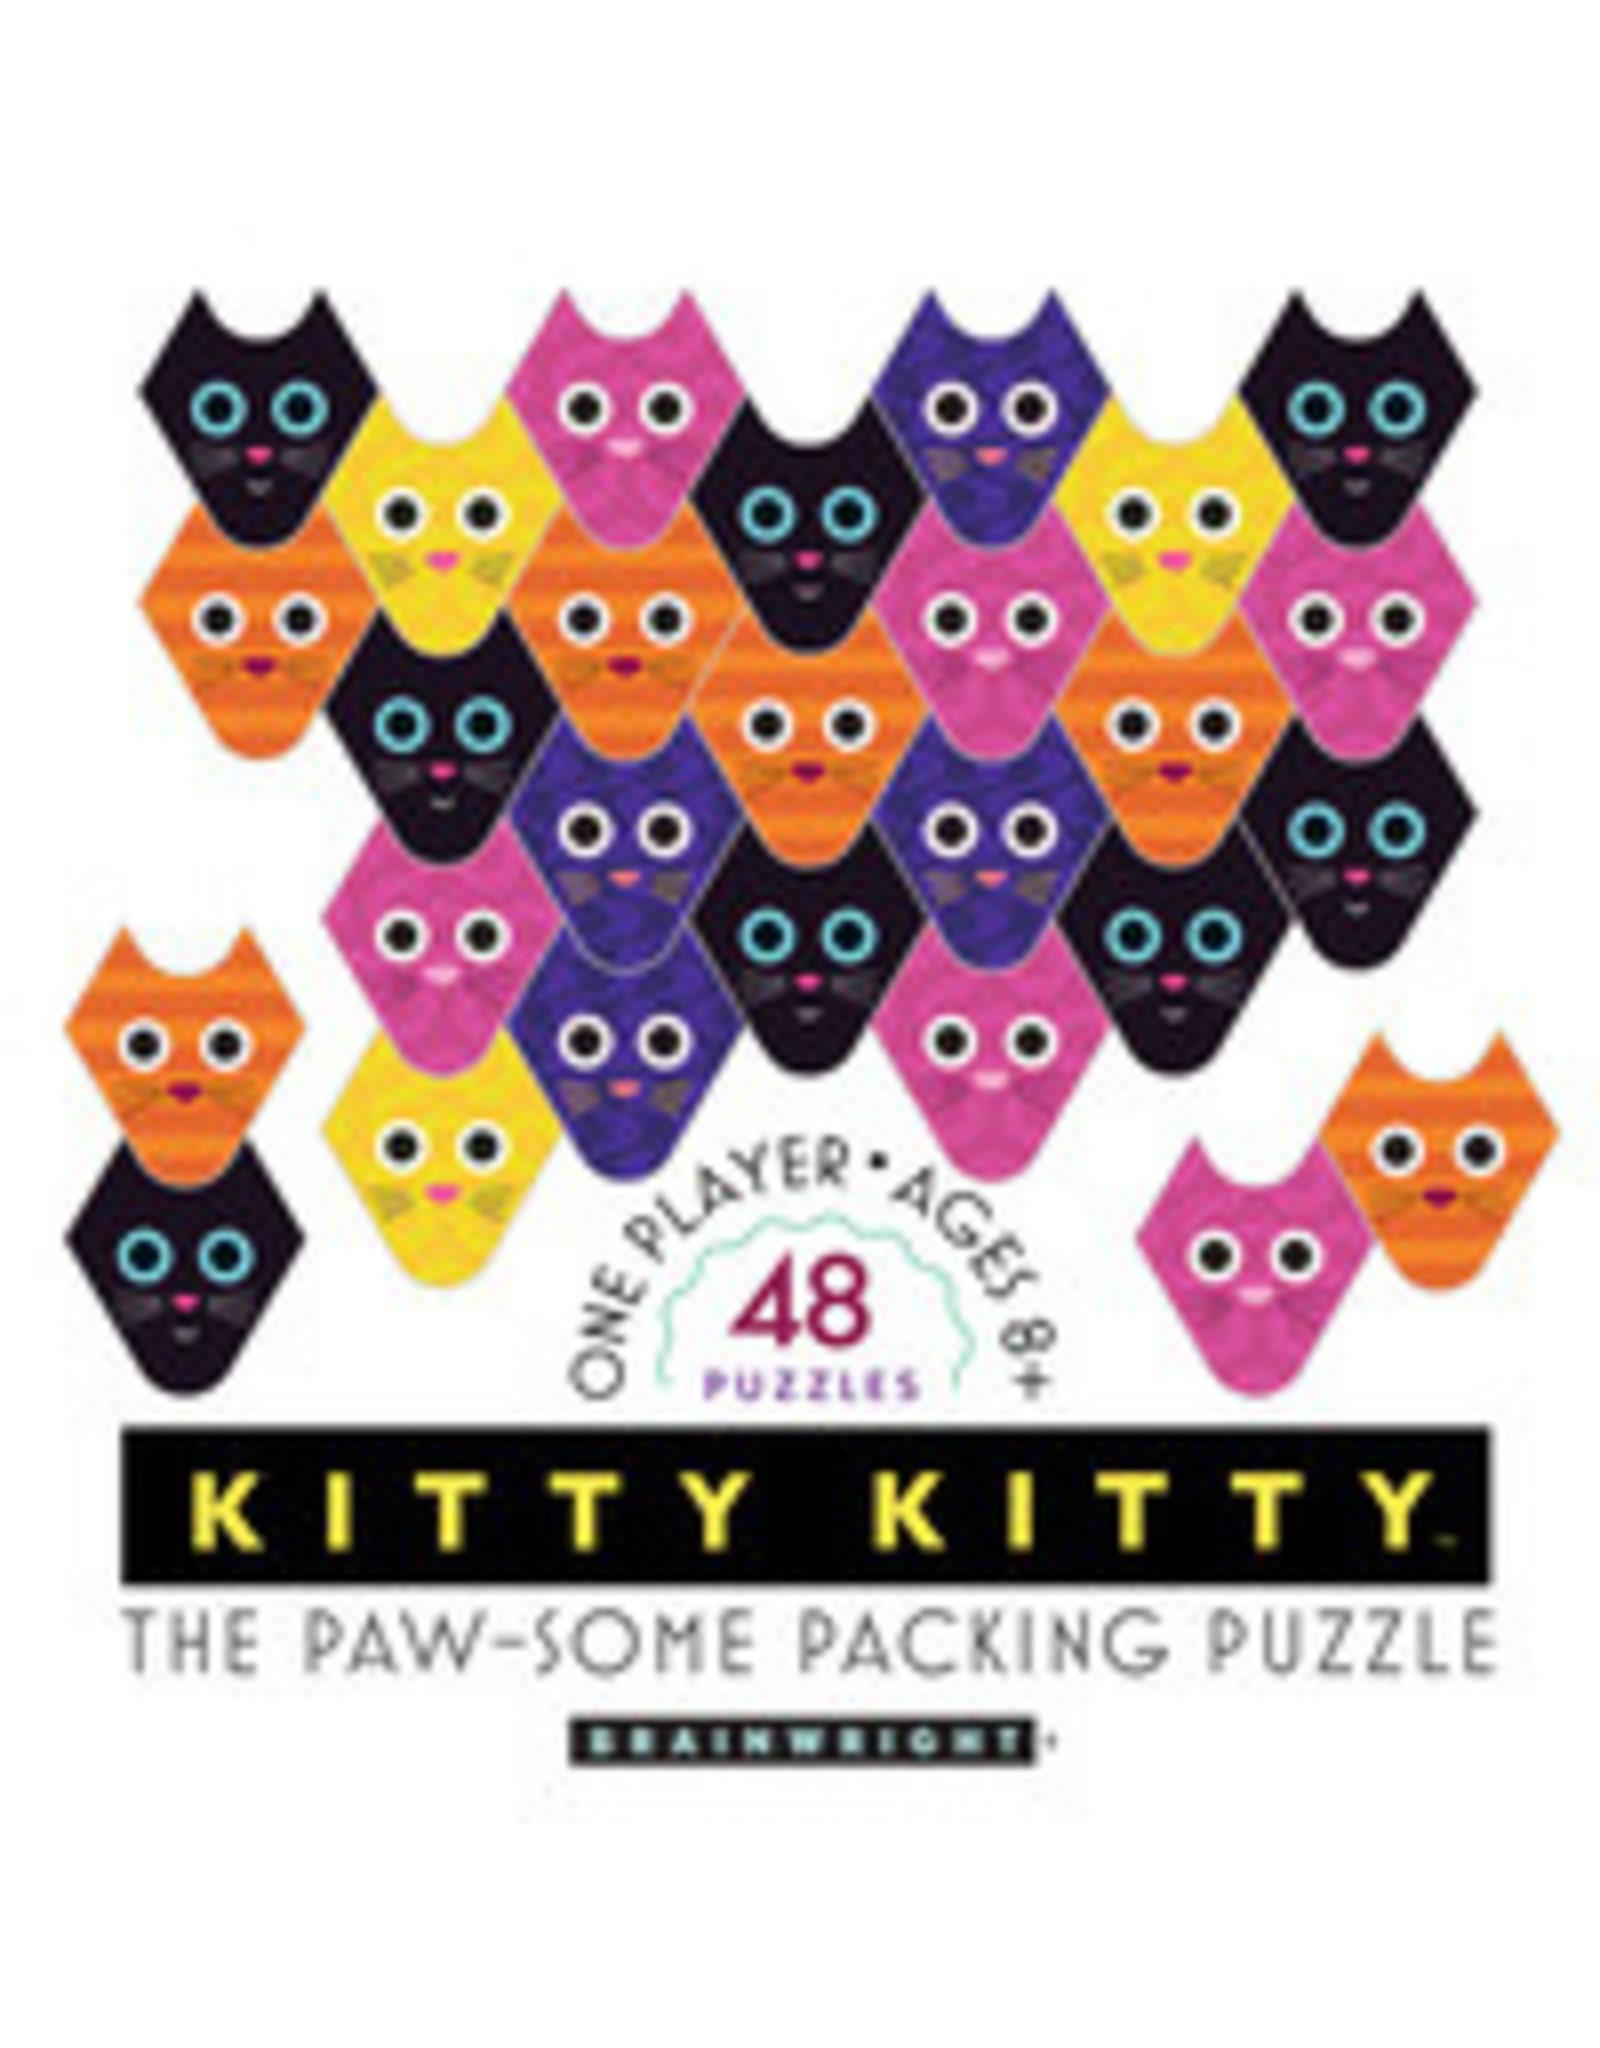 8208 kitty kitty  brainwright